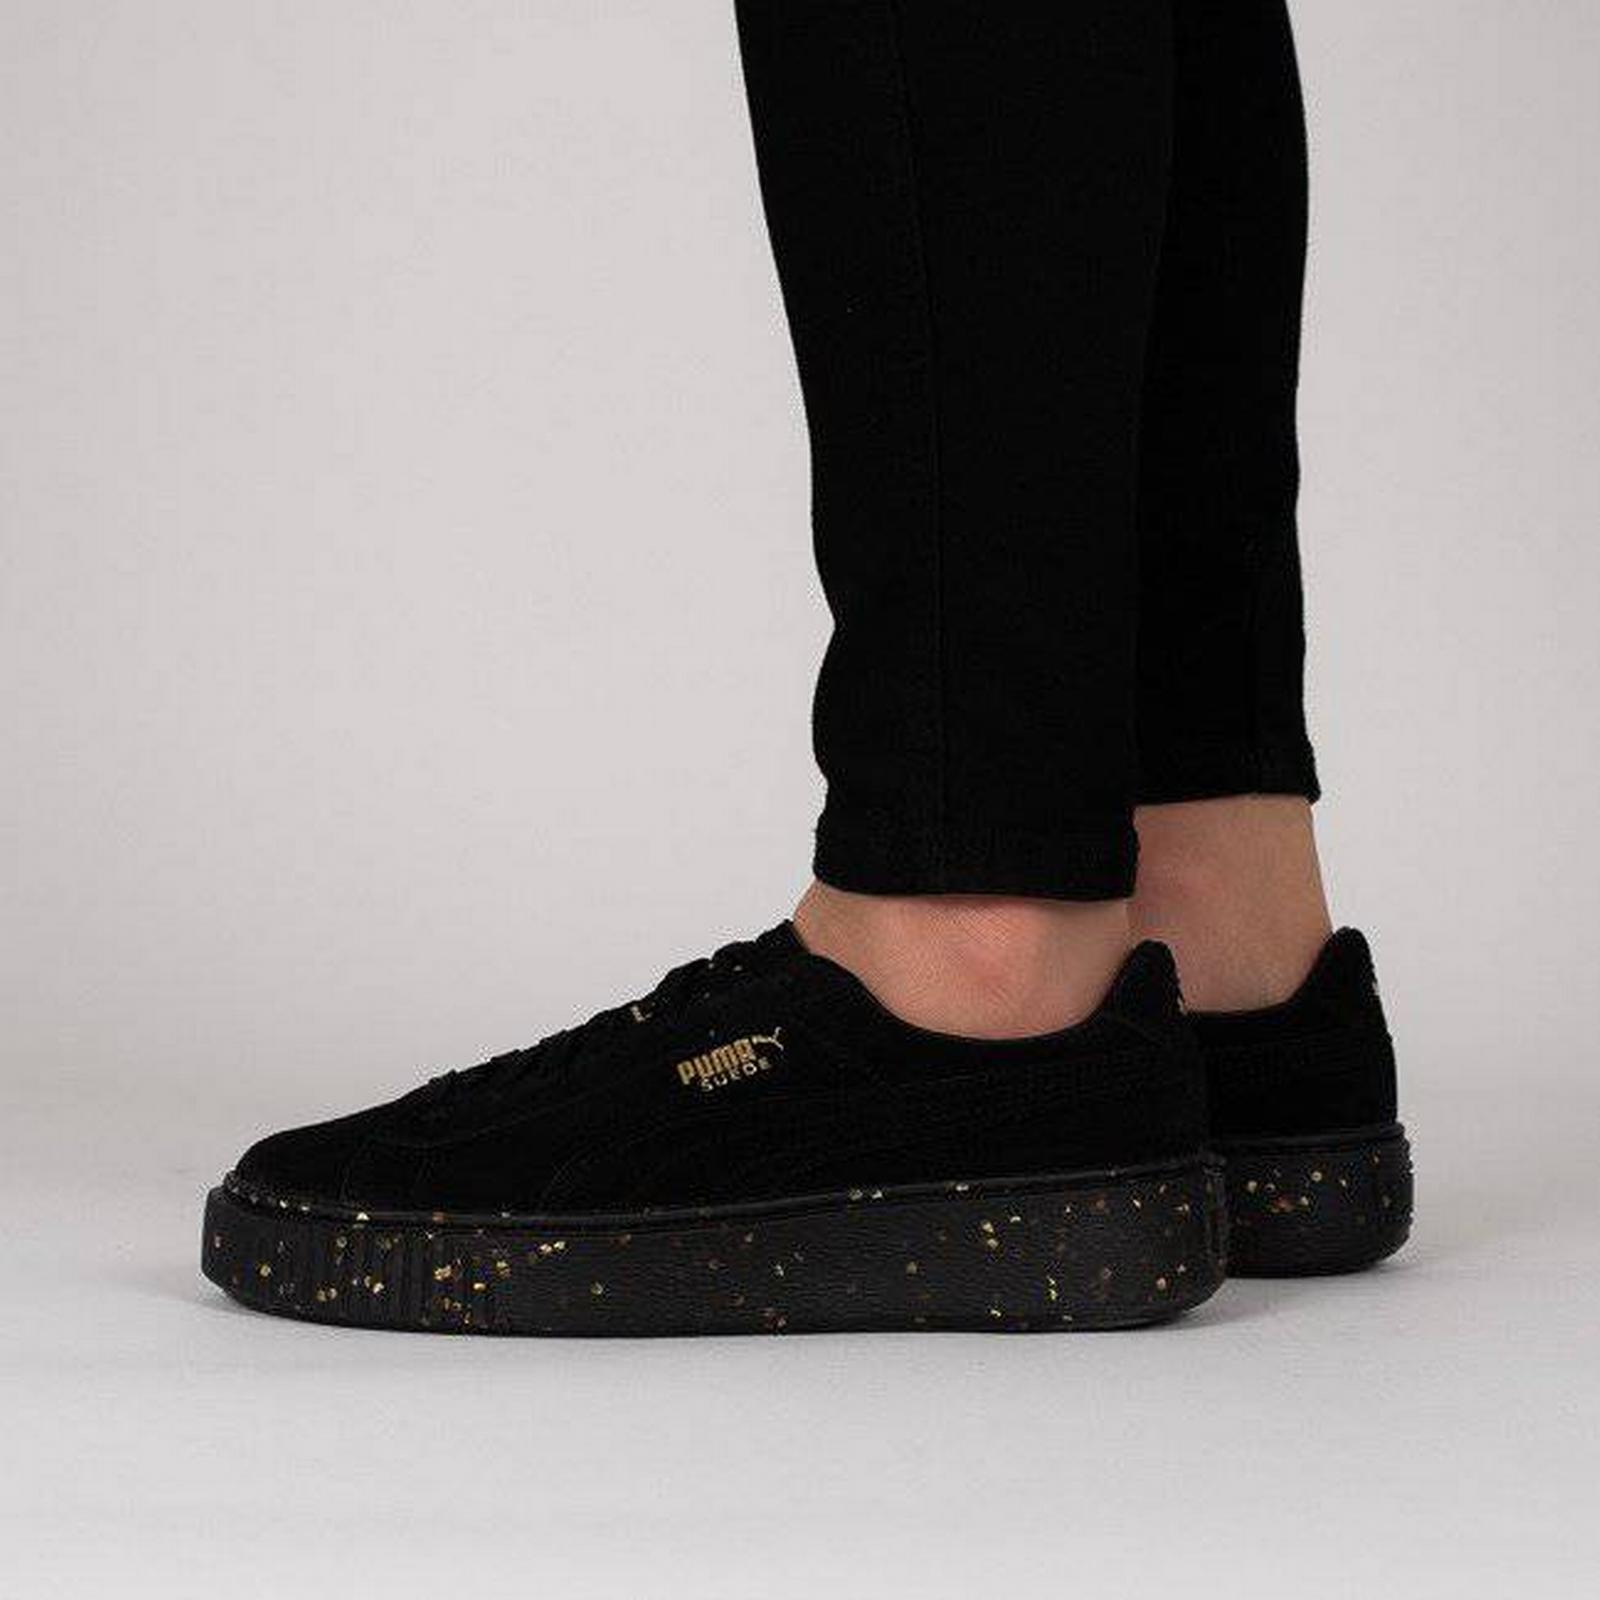 Puma Women's Shoes sneakers 365621 Puma Suede Platform Celebrate 365621 sneakers 01 BLACK Size 40,5 4c5067